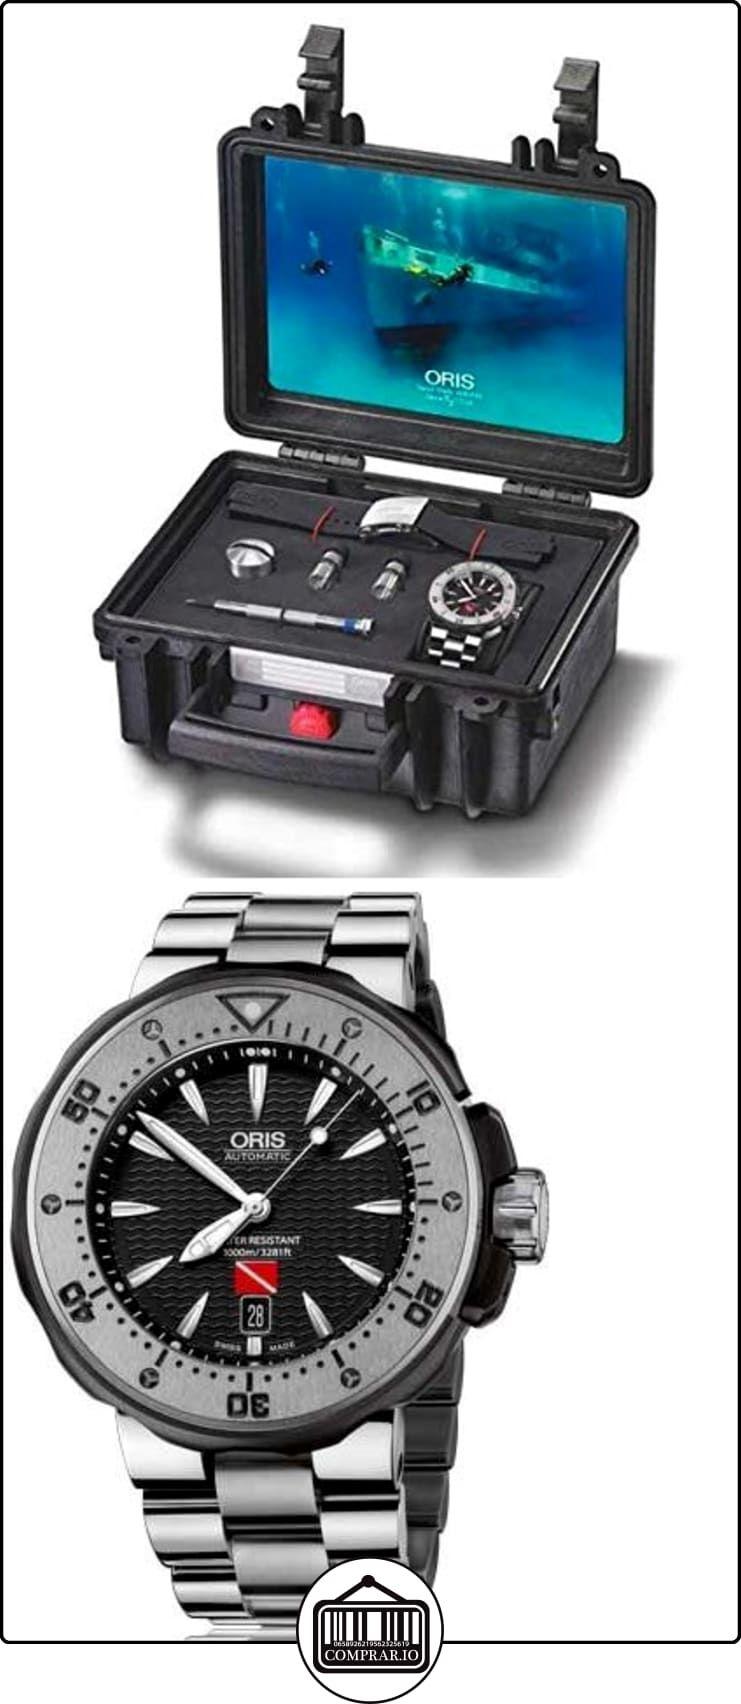 5a65ba9f17d6 KITTIWAKE L.E.SET. relojes hombre OR73376467184 ✿ Relojes para hombre -  (Lujo) ✿